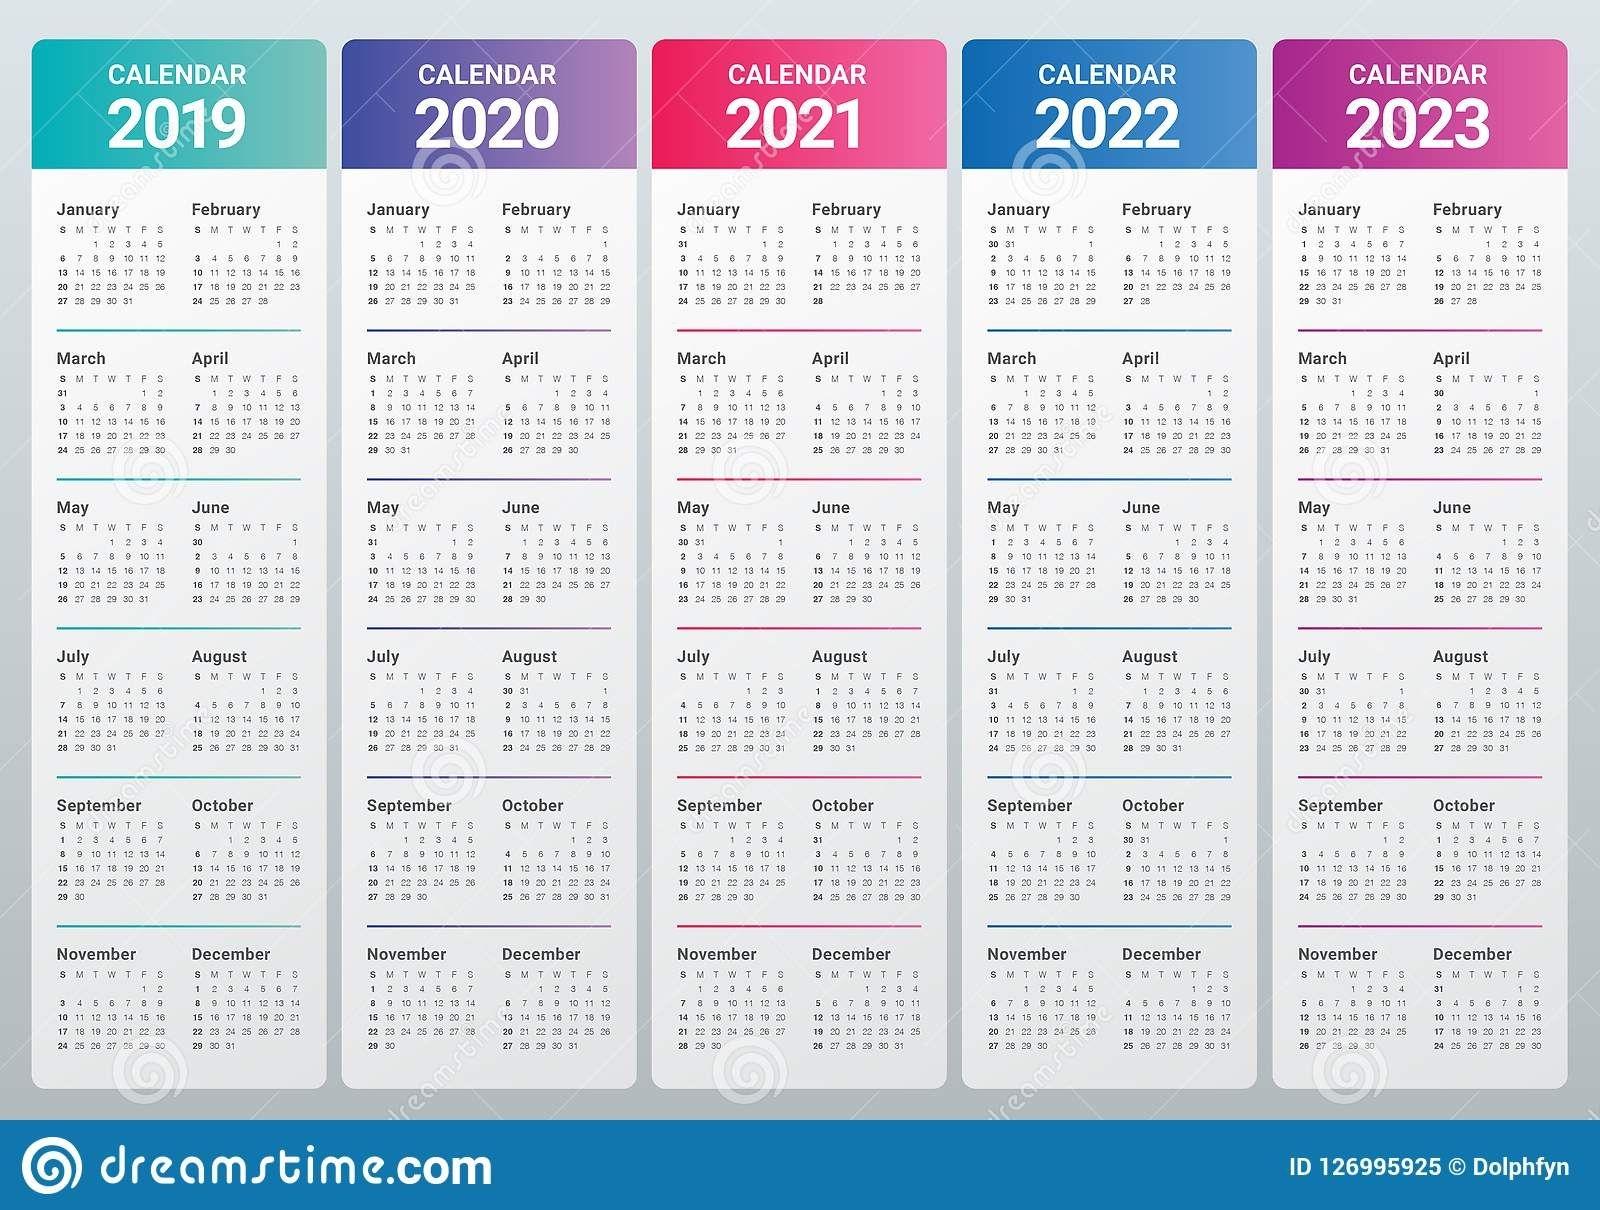 Year 2019 2020 2021 2022 2023 Calendar Vector Design